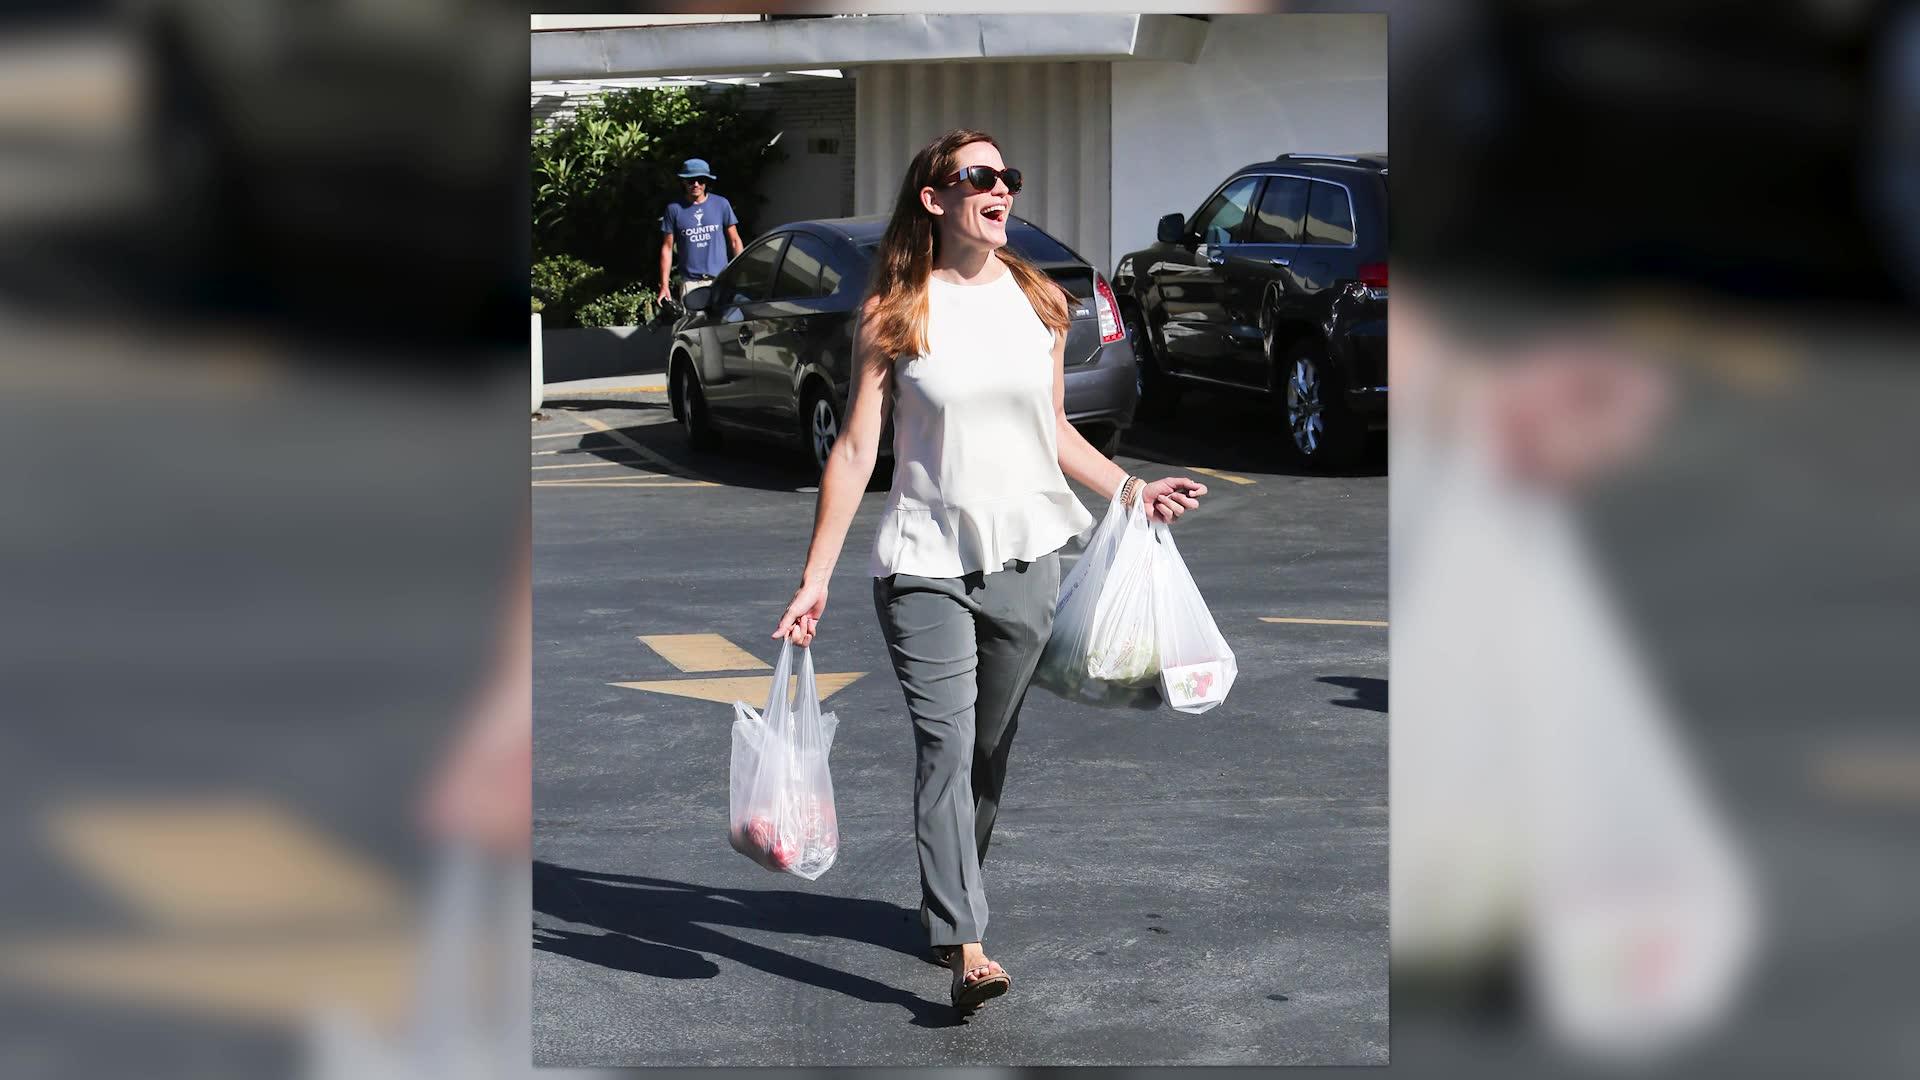 Jennifer Garner Smiles Through Her Split At The Famers Market